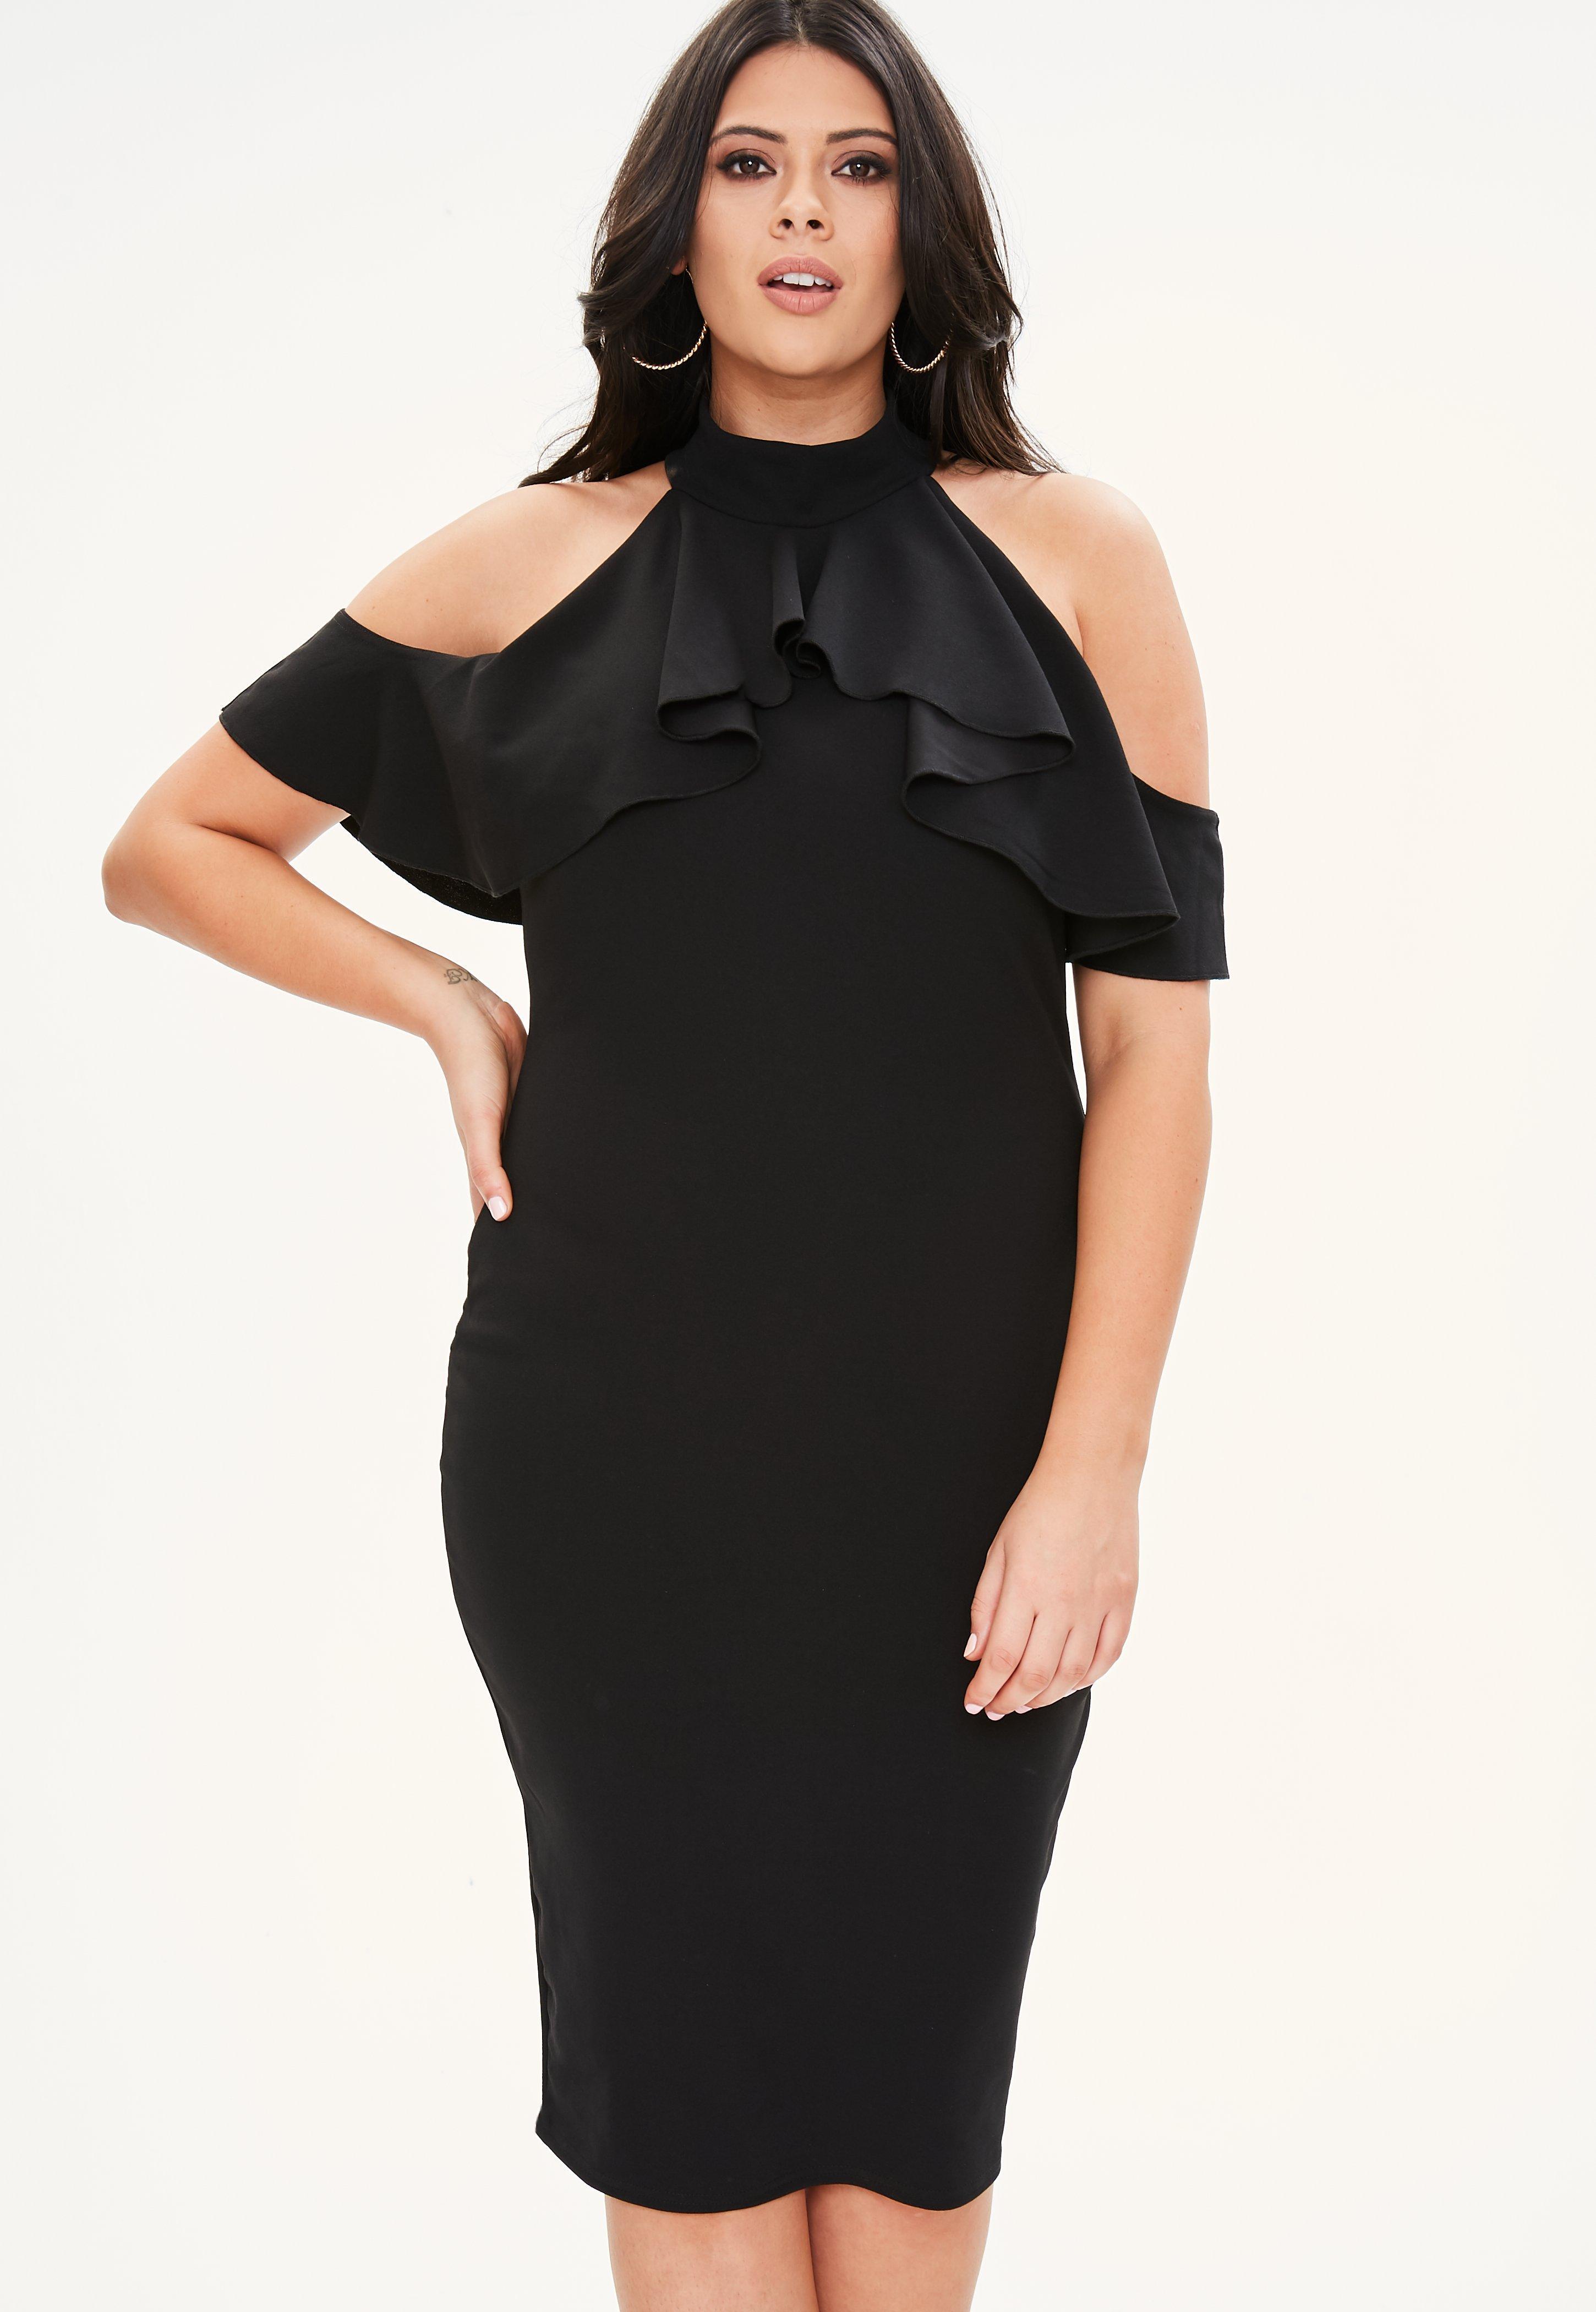 Little Black Dresses | Shop LBD's Online - Missguided Ireland